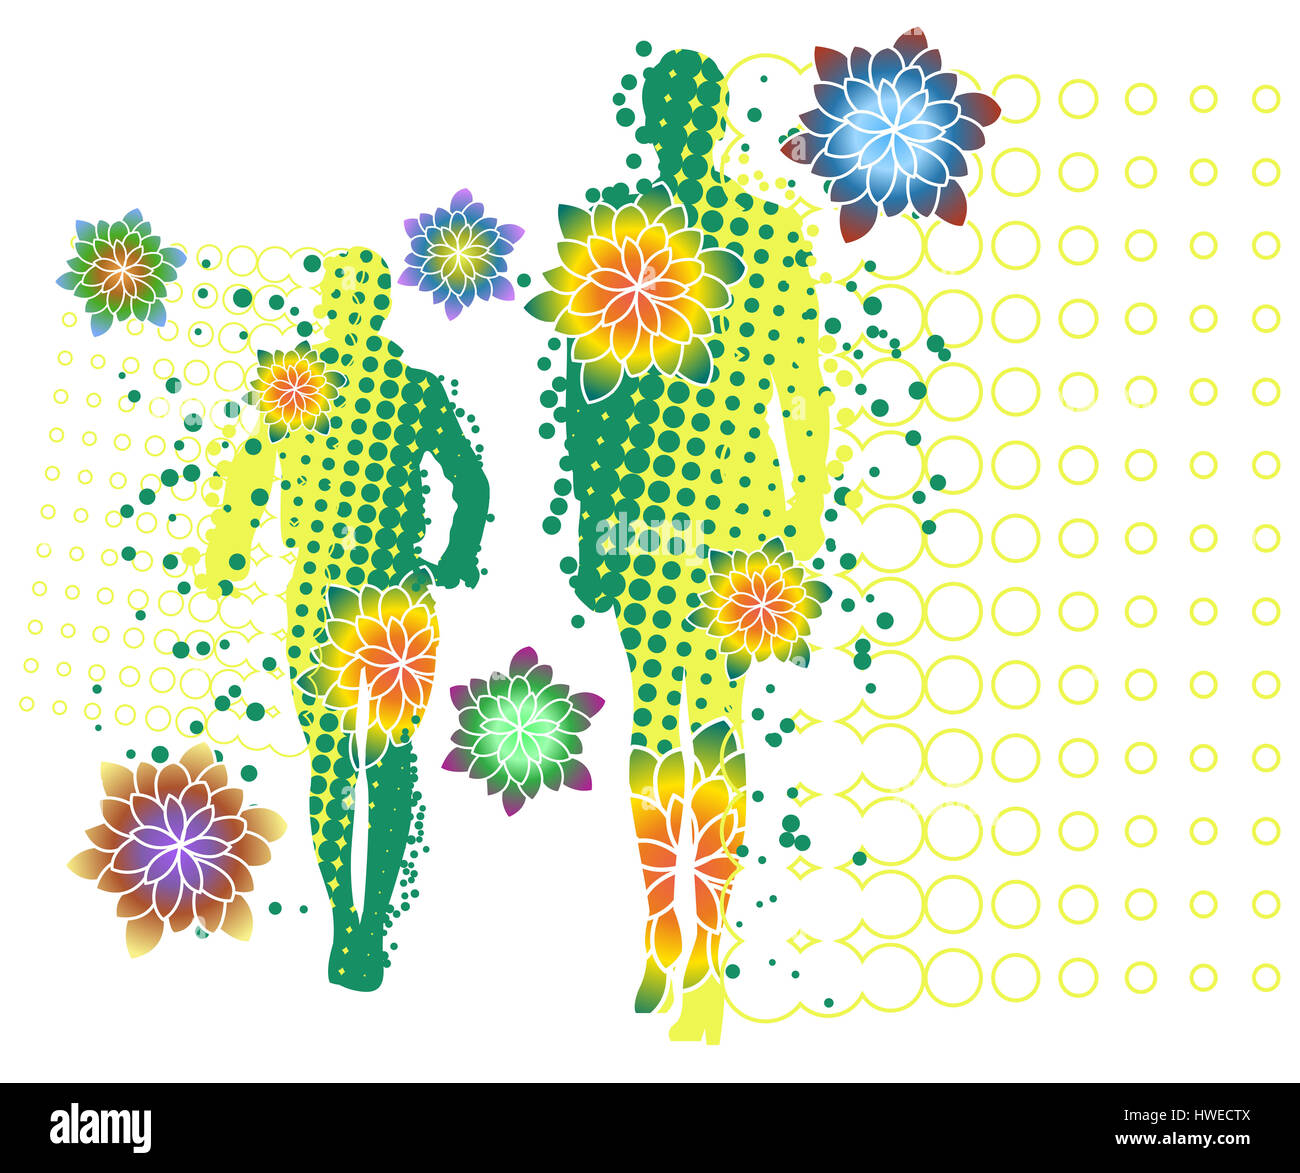 Man Two Man Men Generation Flower Flora Flower Pattern Design Stock Photo Alamy